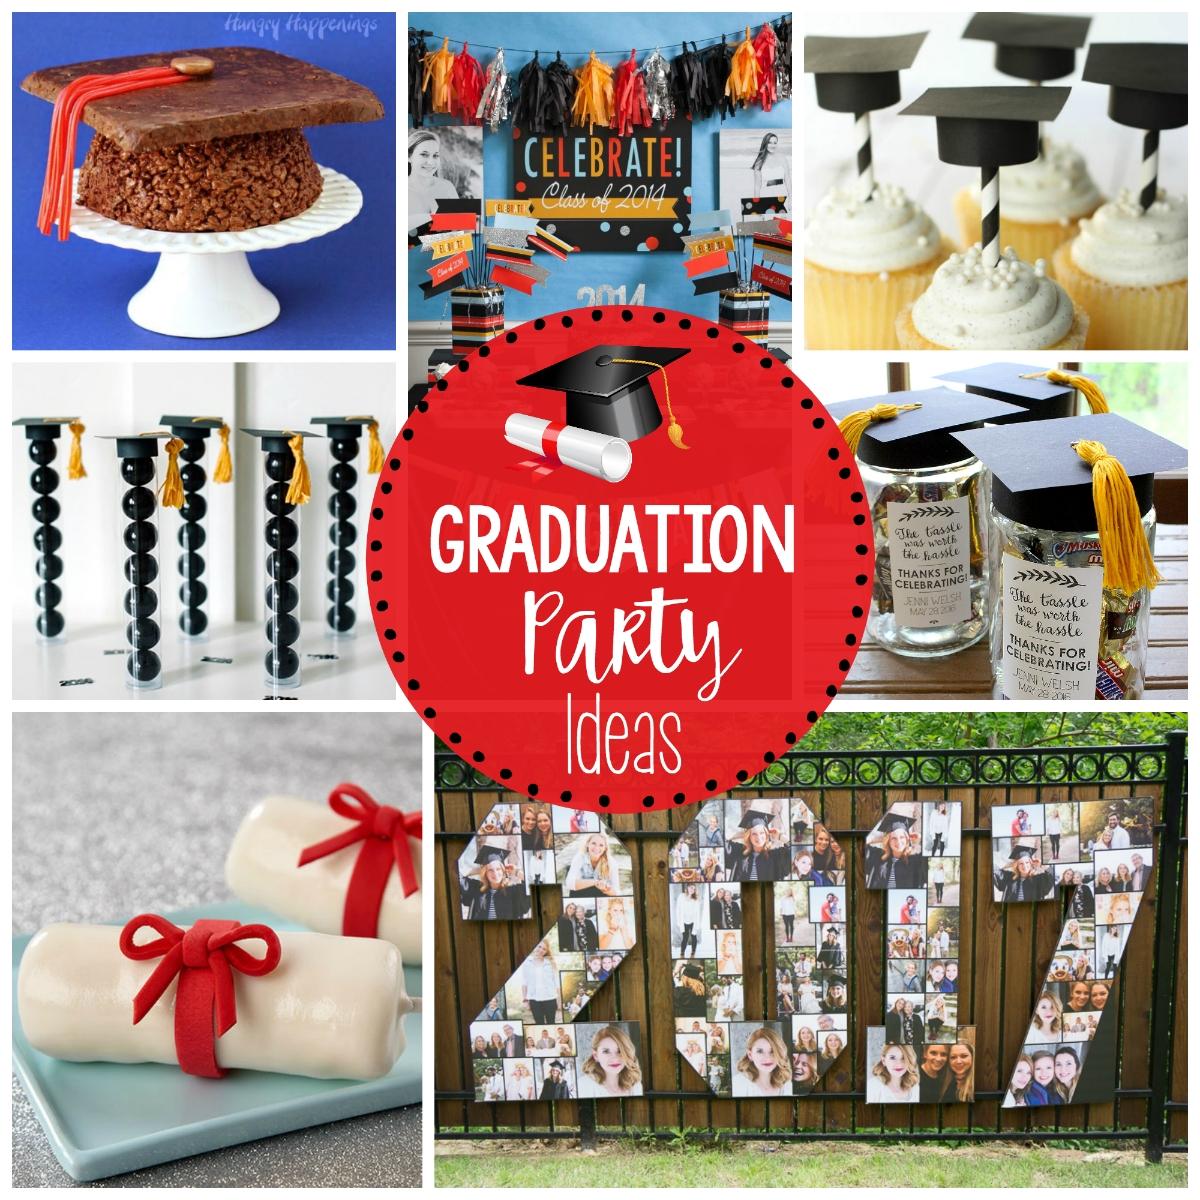 10 Lovable Fun Ideas For Graduation Parties 25 fun graduation party ideas fun squared 2020